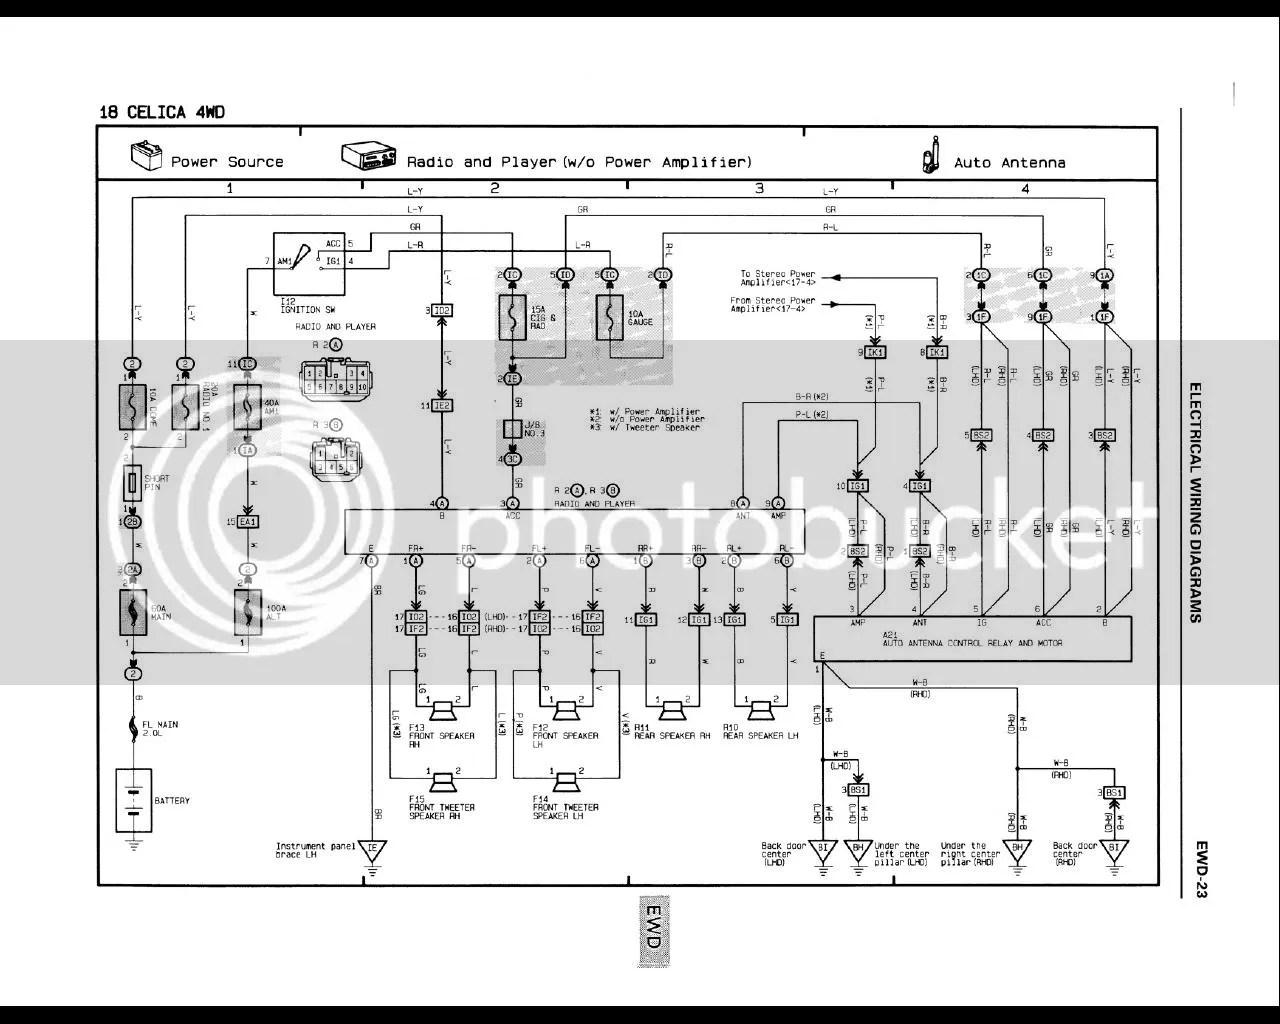 subwoofer wiring diagram for 6 subs belling electric cooker premium 8 speaker system 6g celicas forums